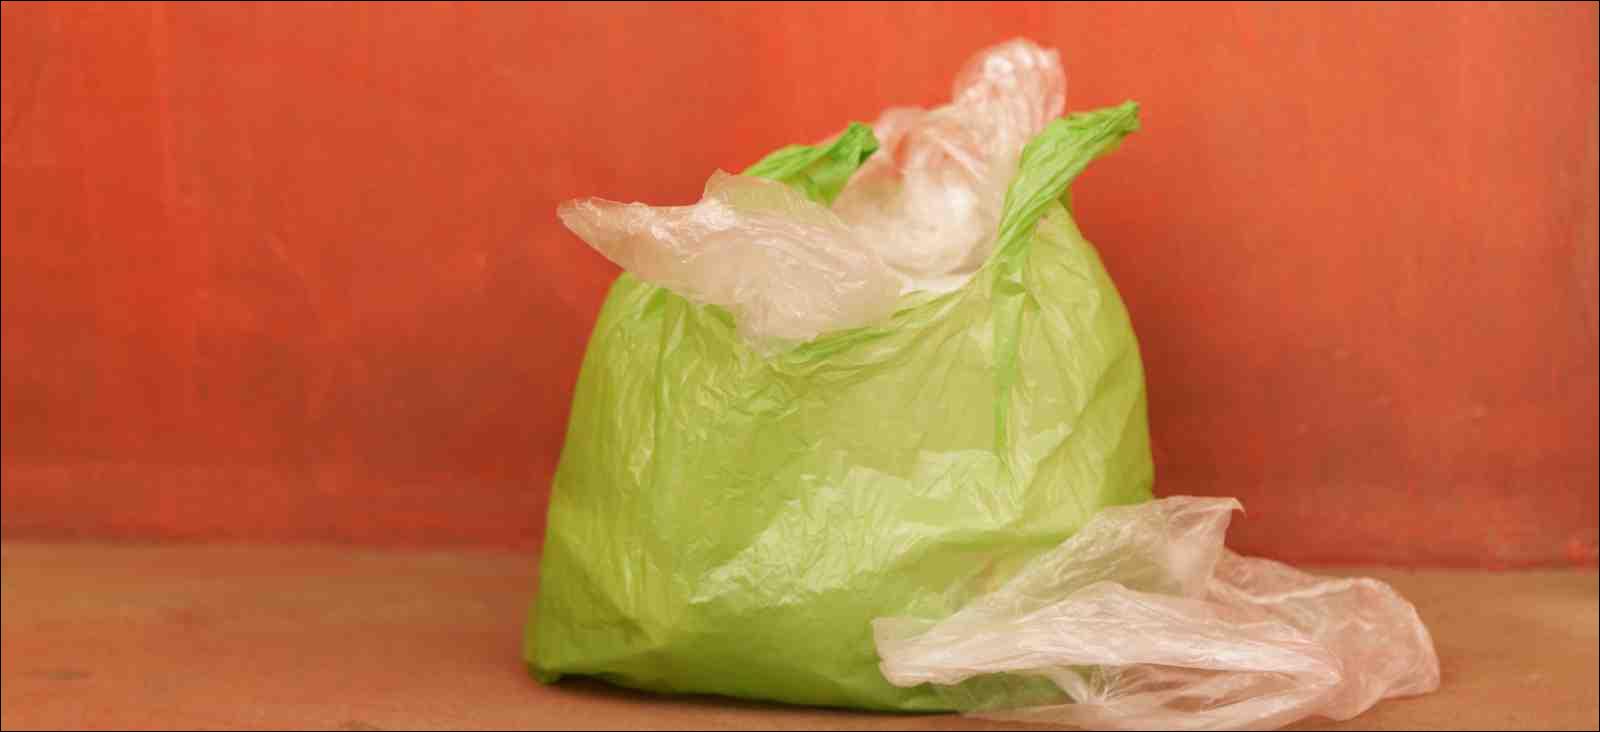 Plastic shopping bag full of other plastic bags